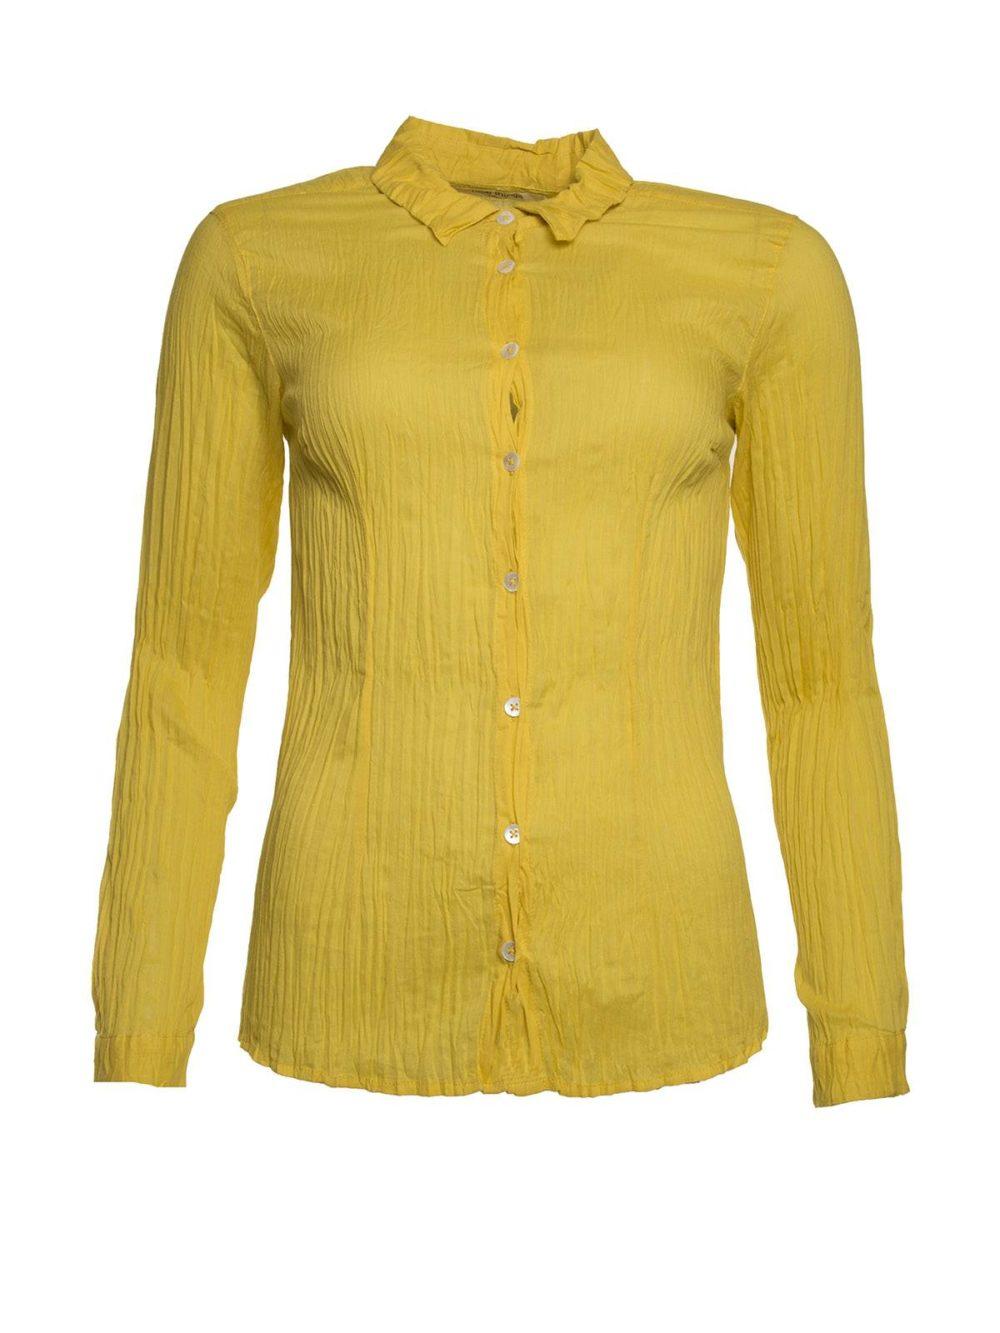 Basic Shirt Nice Things Katie Kerr Women's Clothing